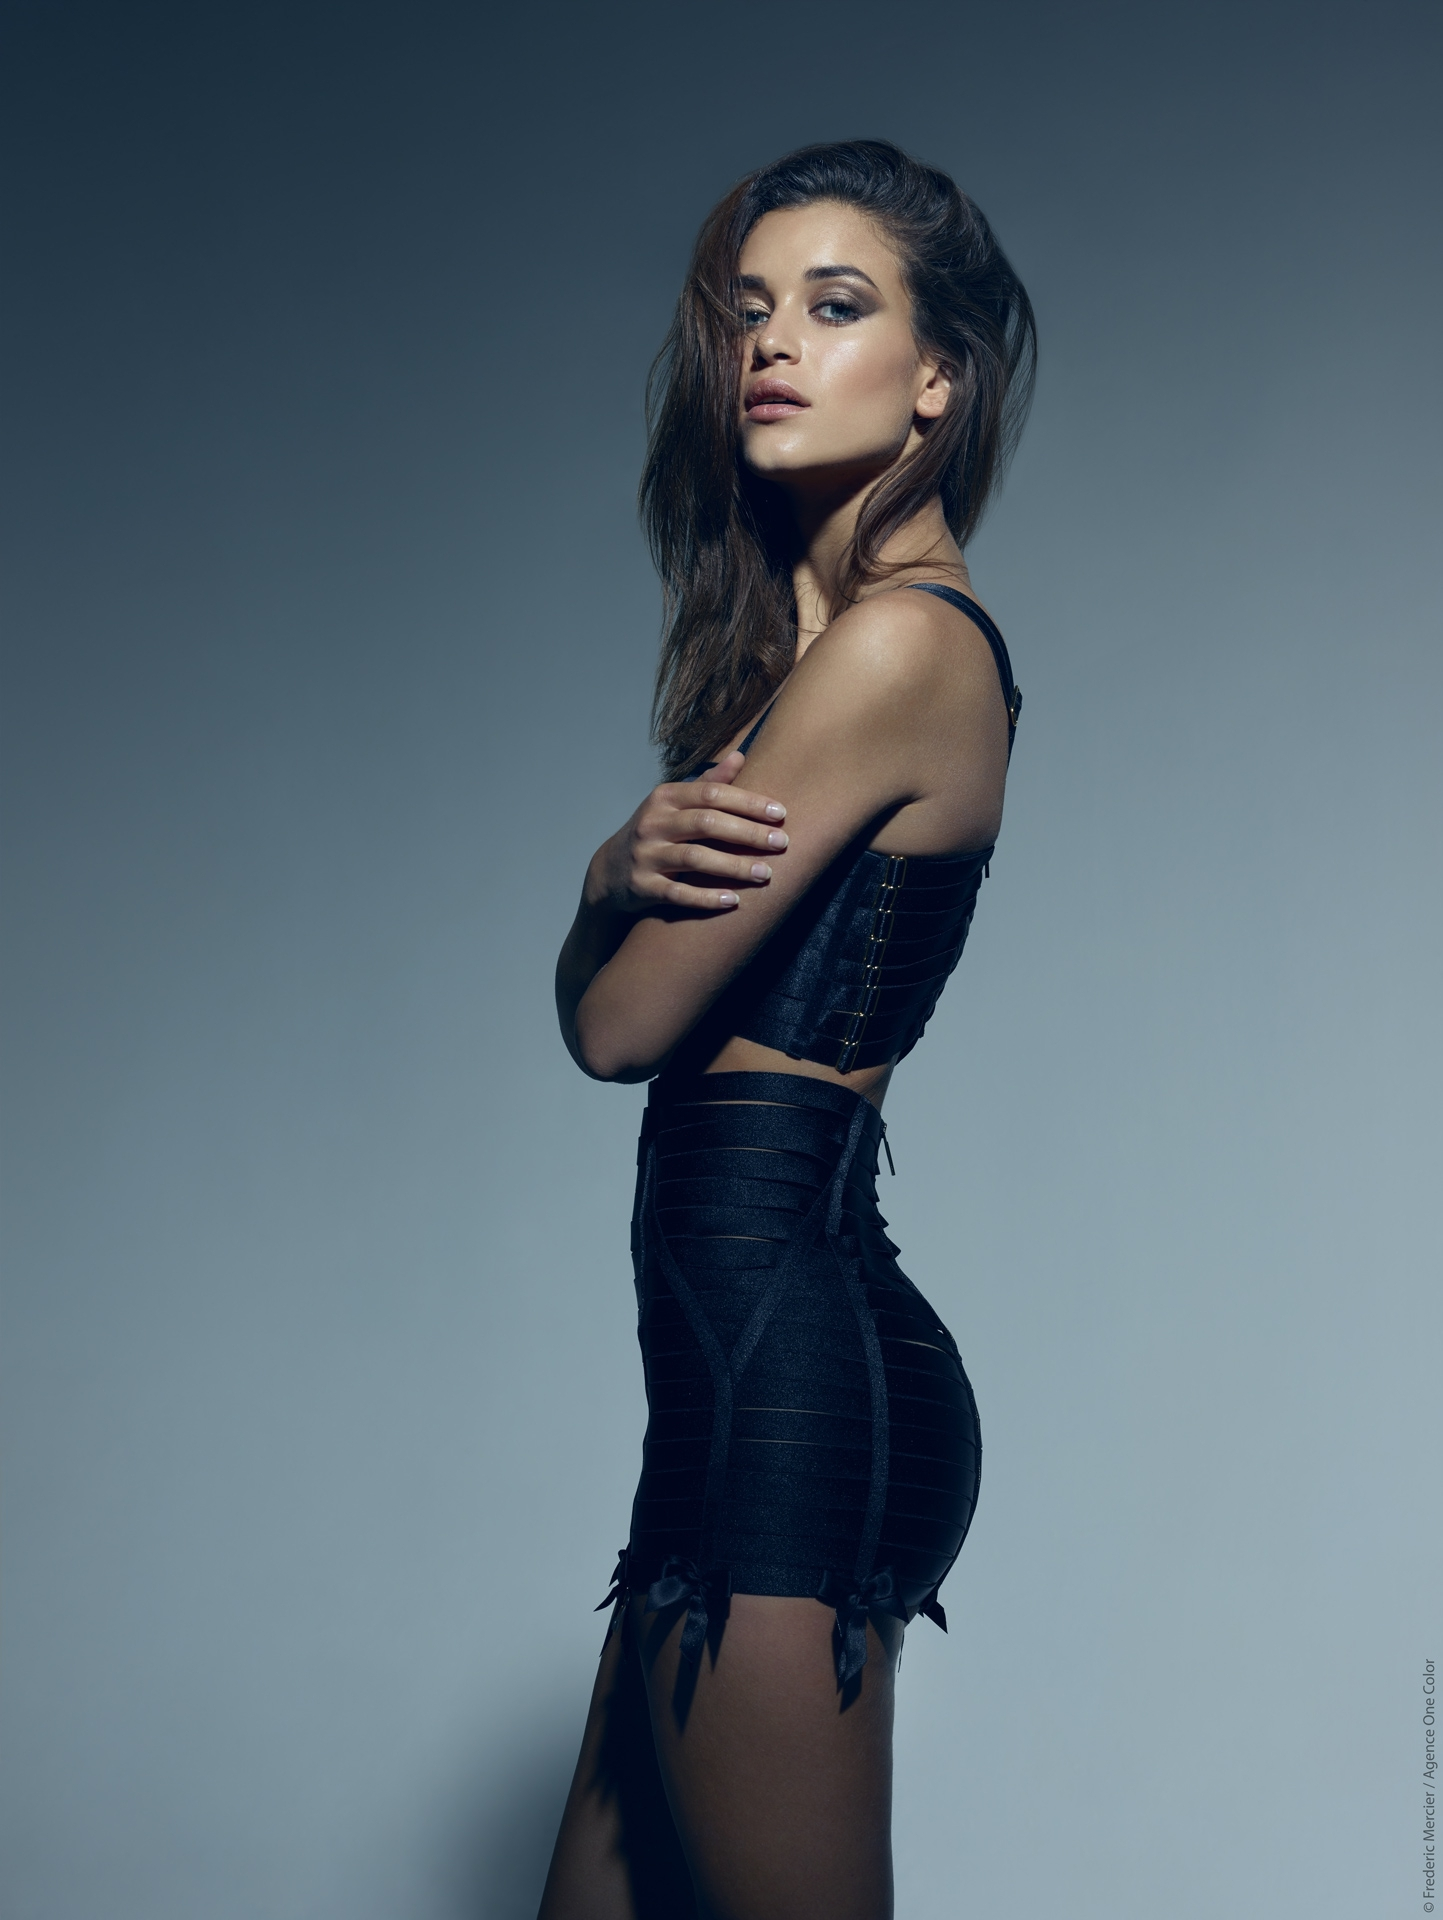 editorial model bordelle lingerie frederic mercier photographer one color